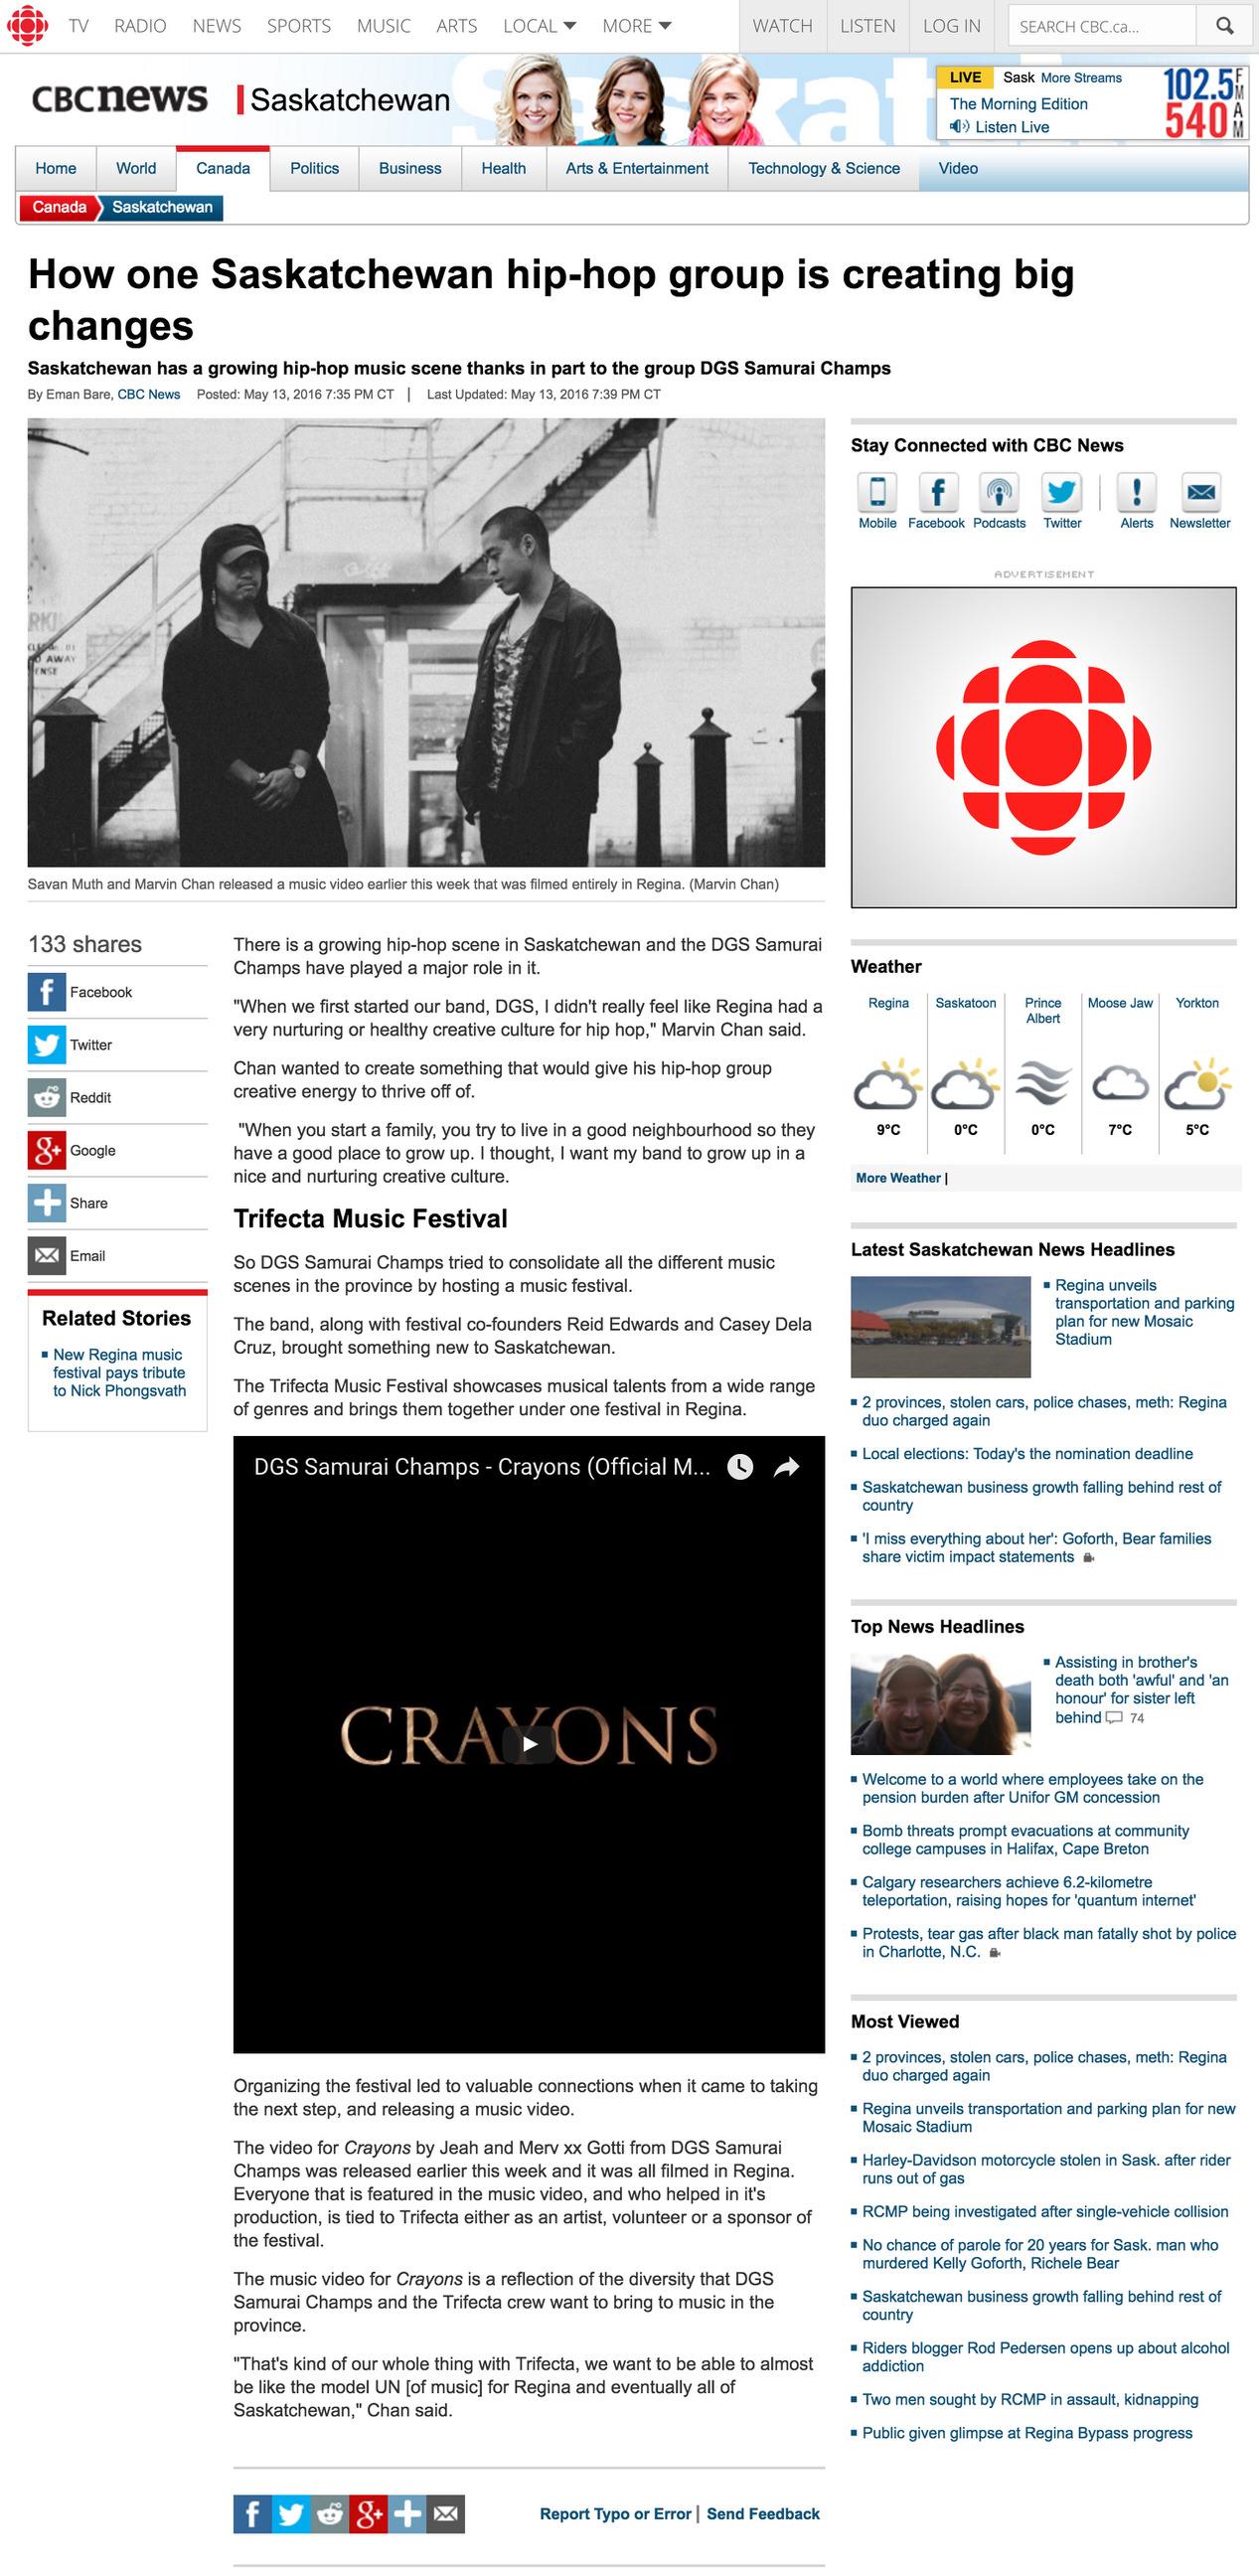 How one Saskatchewan hip hop group is creating big changes | CBC-2.jpg